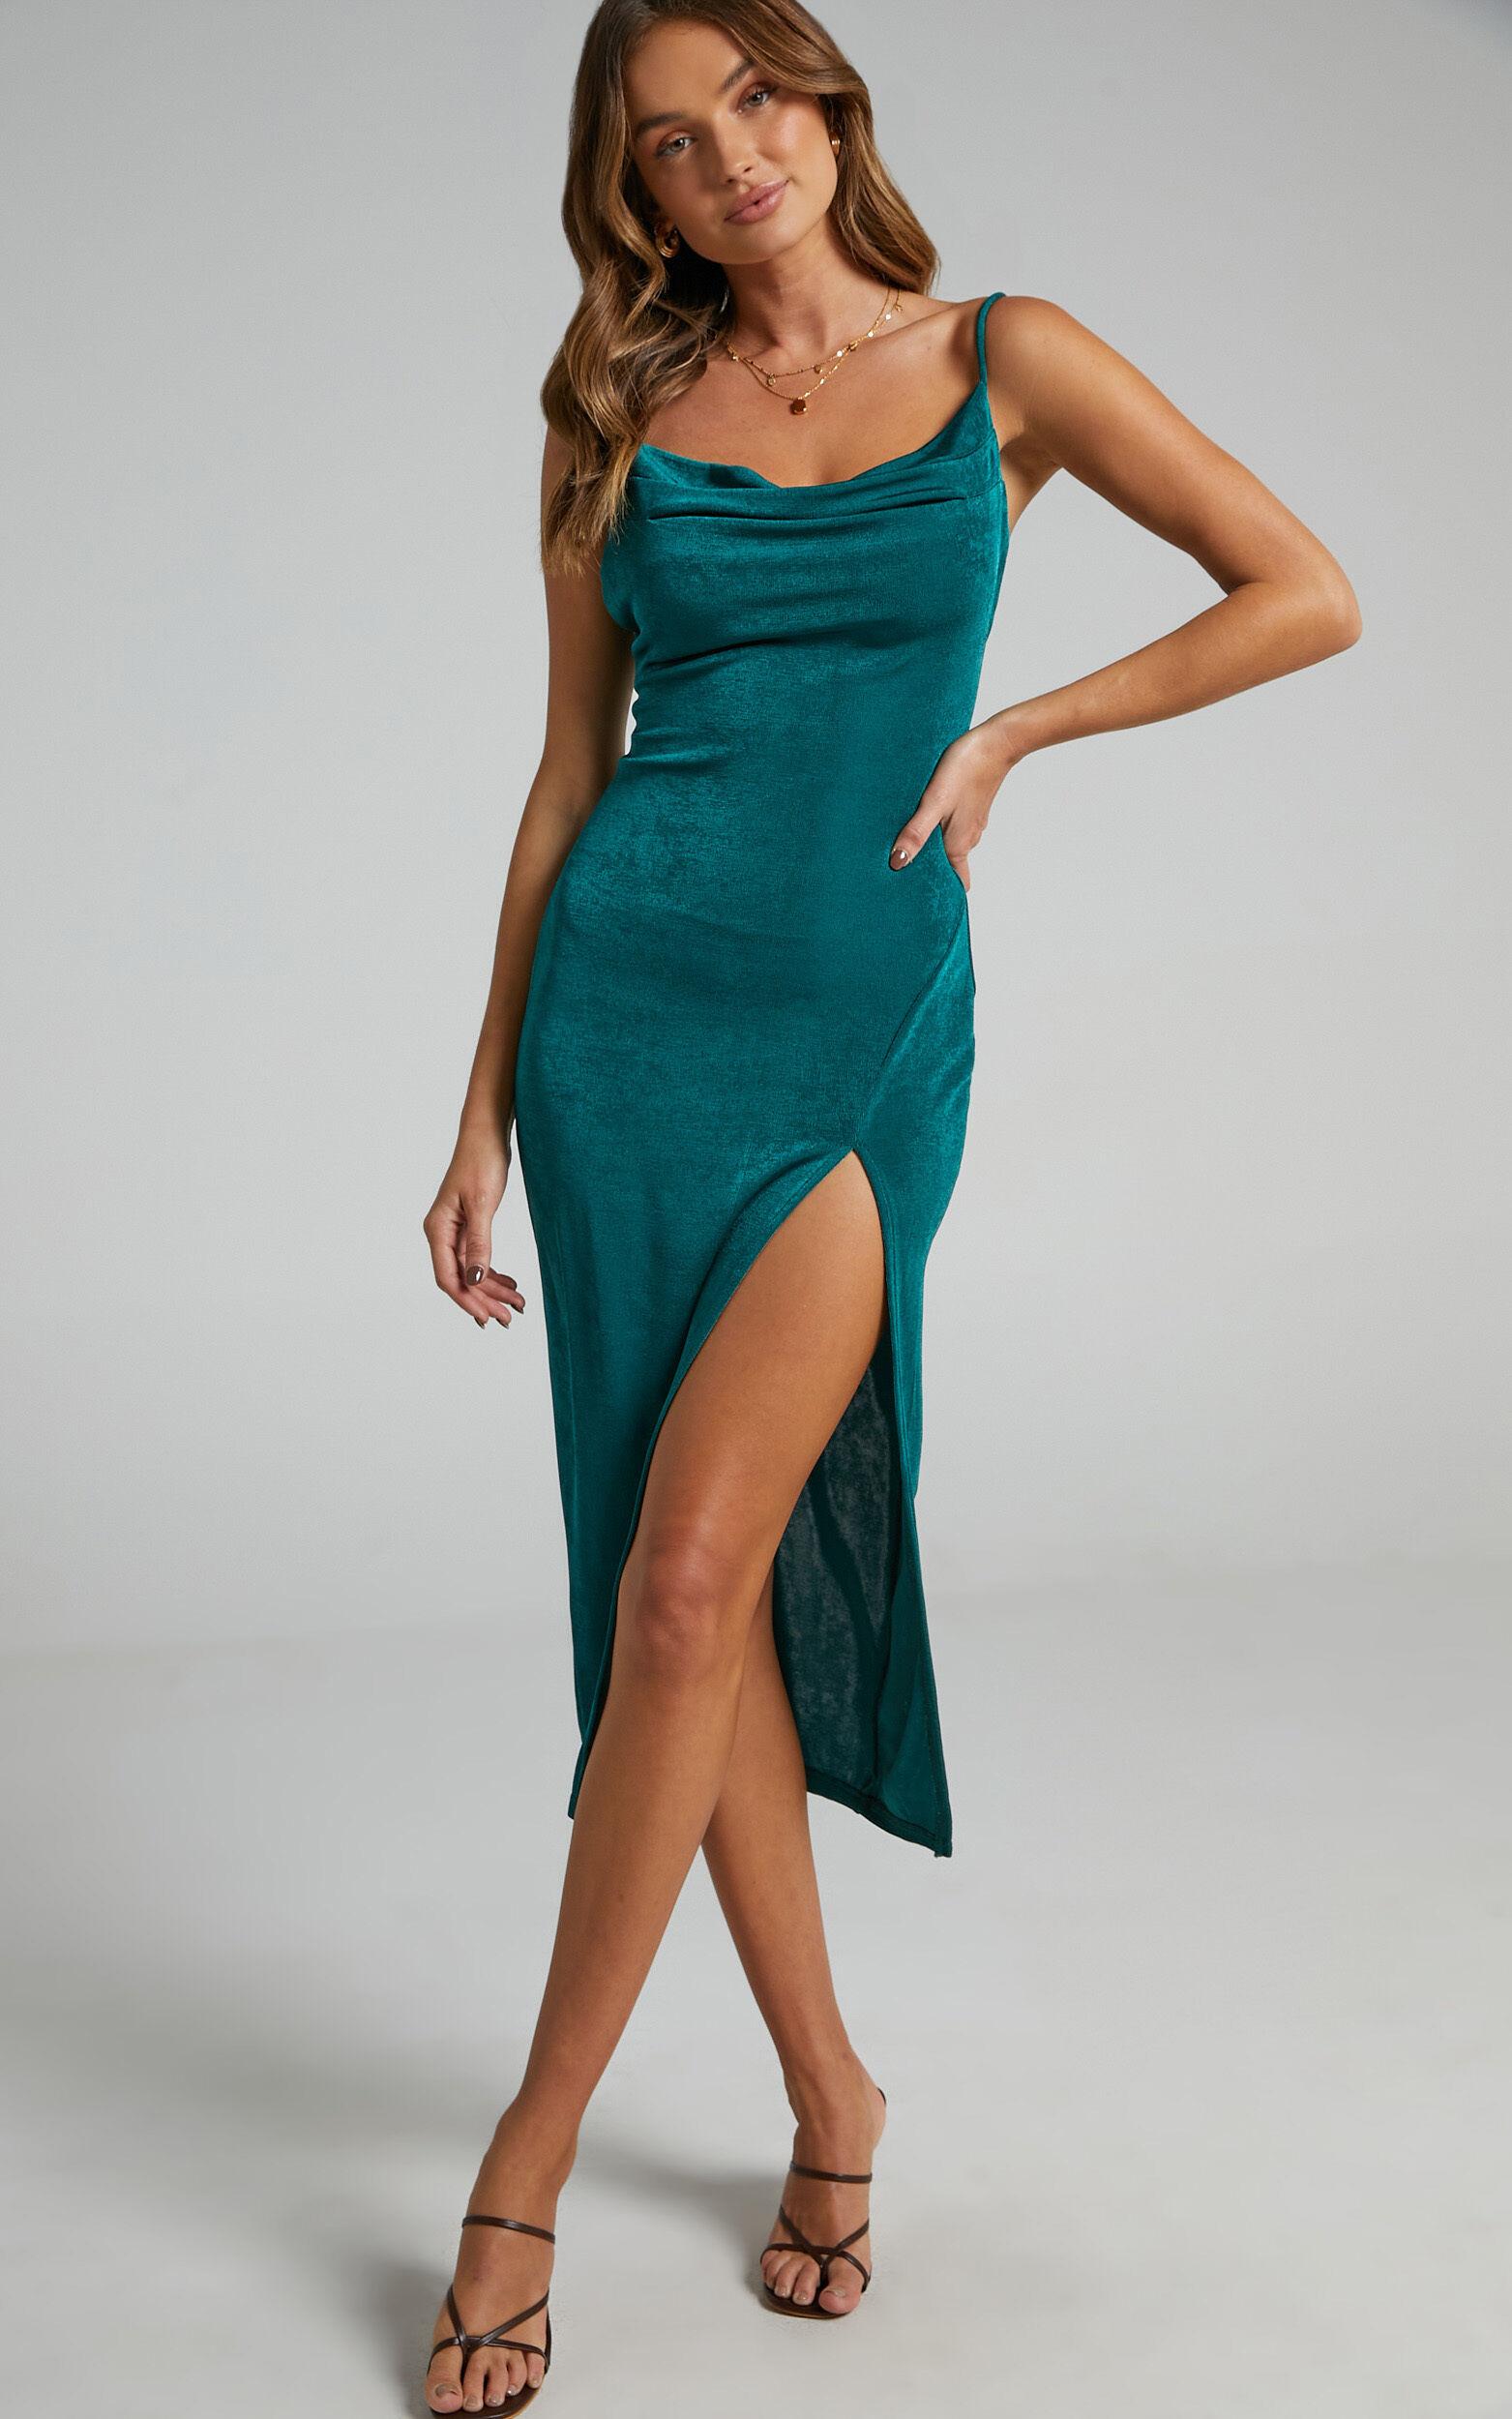 She.Is.Us - Slinky Slip Dress in Emerald - L, GRN2, super-hi-res image number null